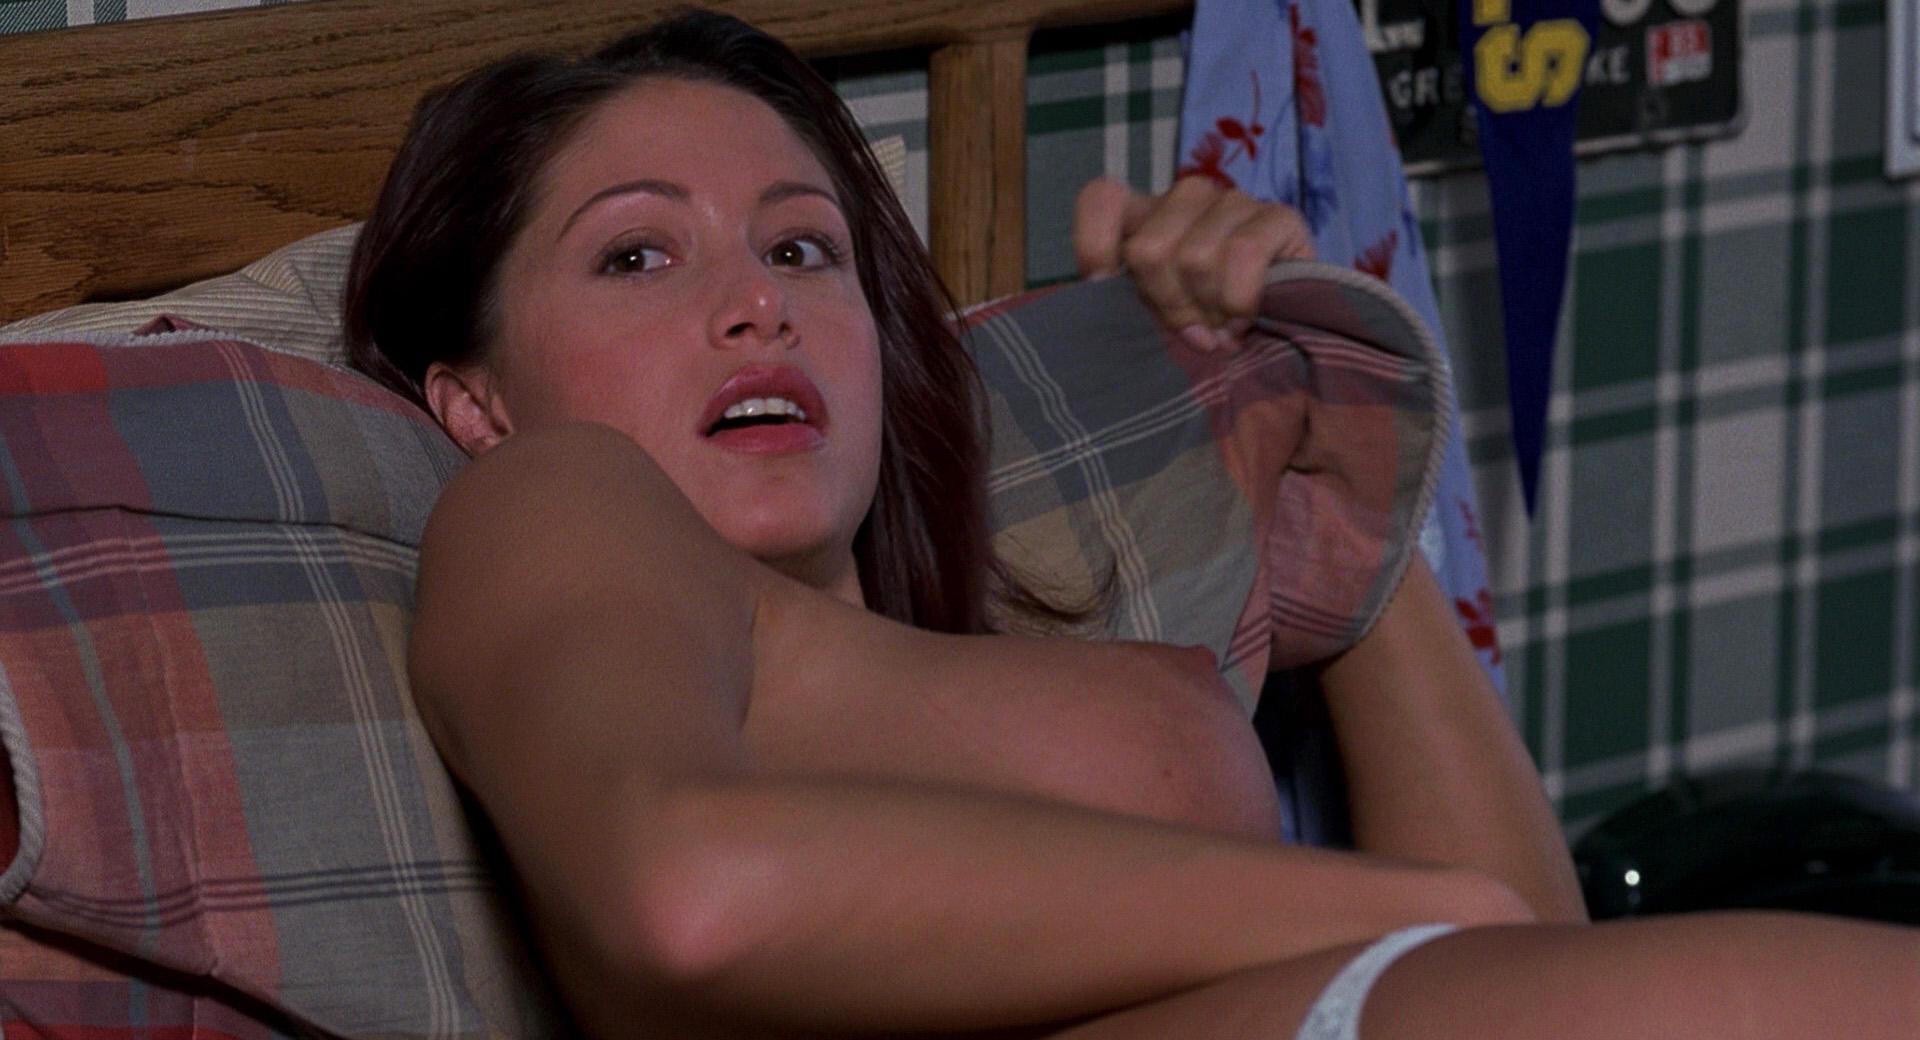 American Pie Sex Images watch online - shannon elizabeth – american pie (1999) hd 1080p